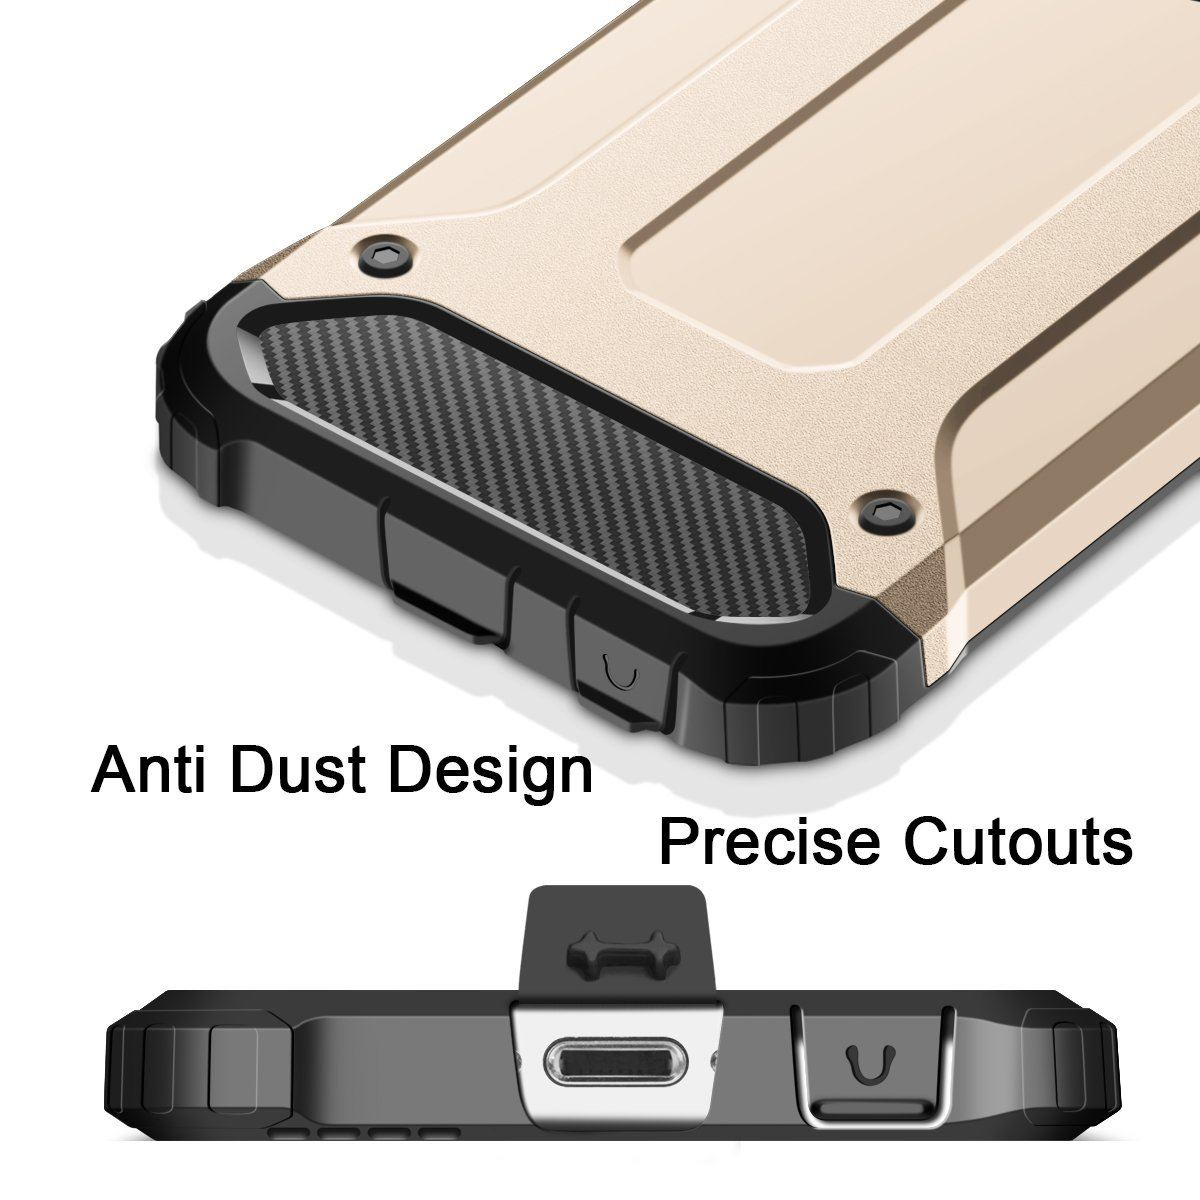 thumbnail 59 - For Apple iPhone 11 Pro Max XR Xs X 8 7 Plus 6 5 Se Case Cover Impact Heavy Duty